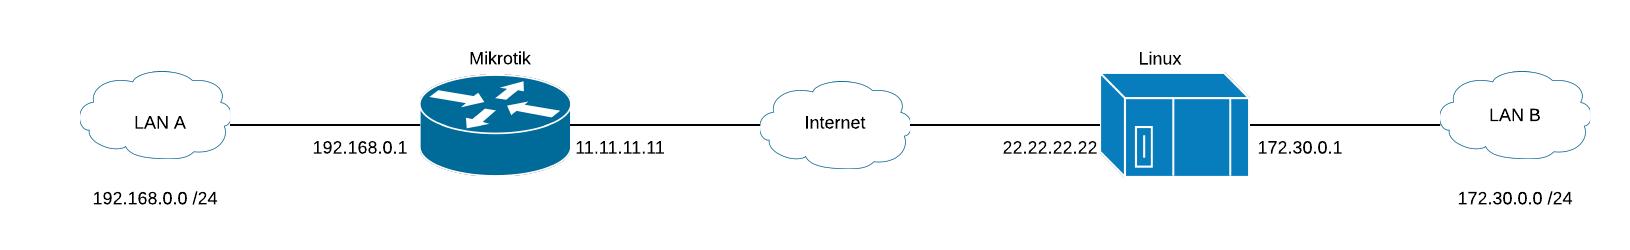 IPsec VPN Mikrotik to Linux | IPNET